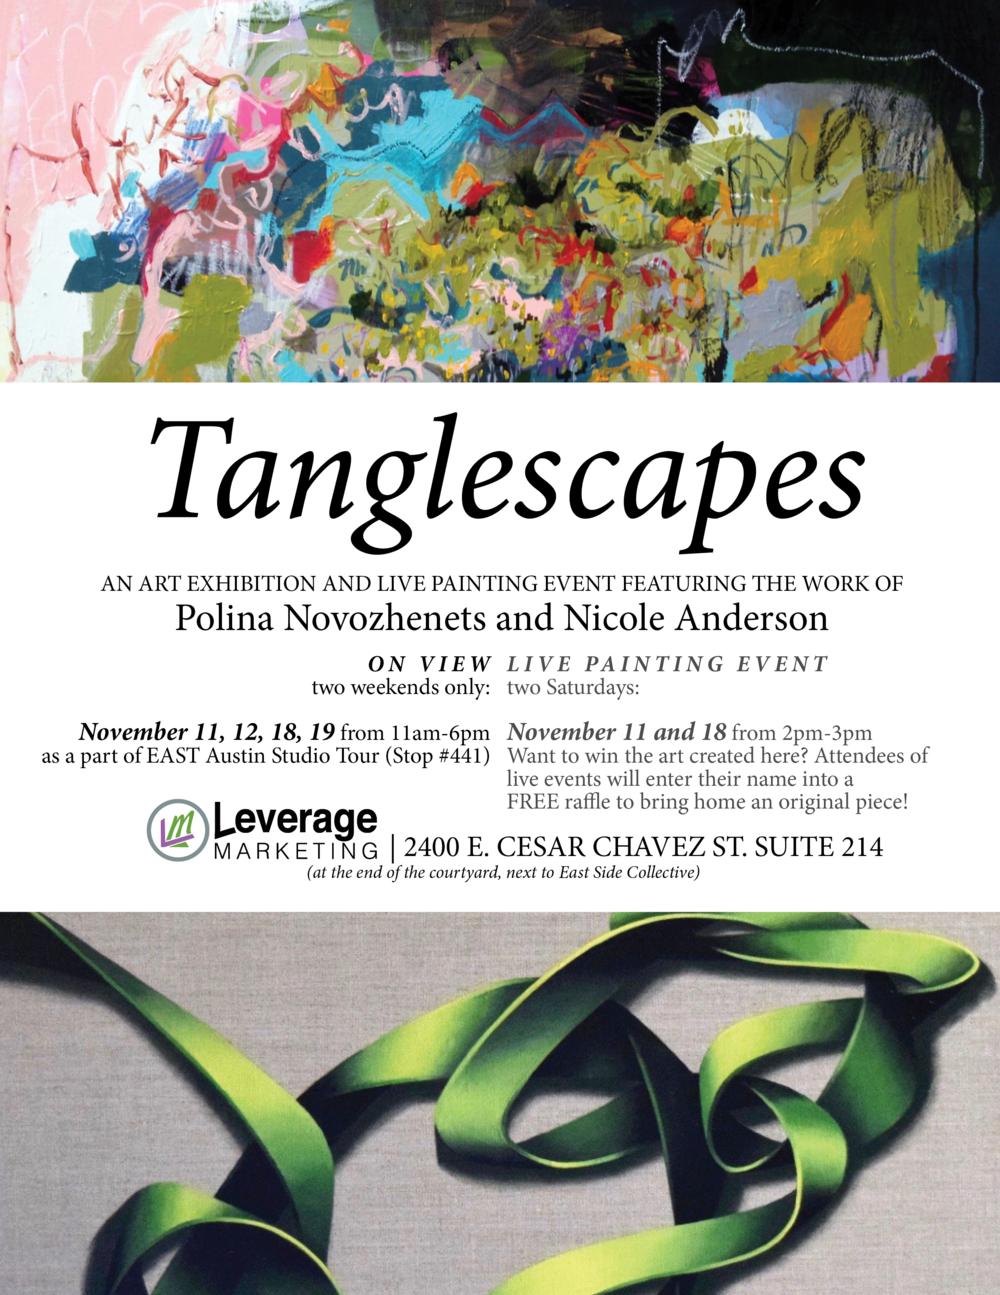 Tanglescapes_facebook3.jpg